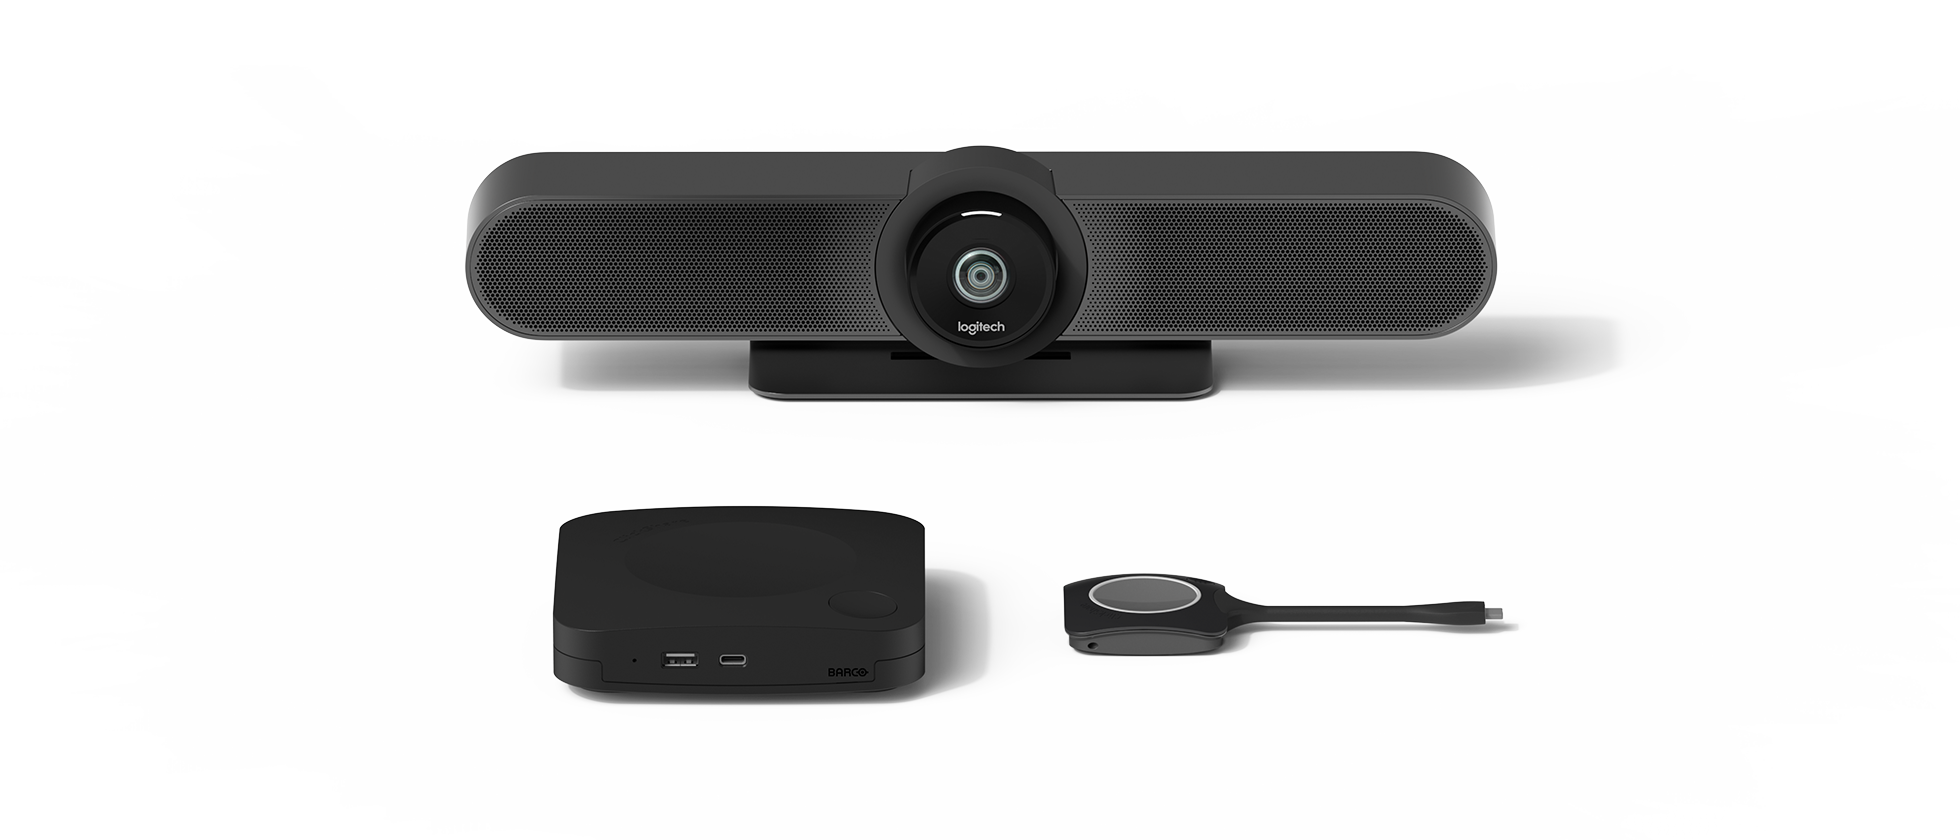 Комплект Small для видеоконференций Barco + Logitech